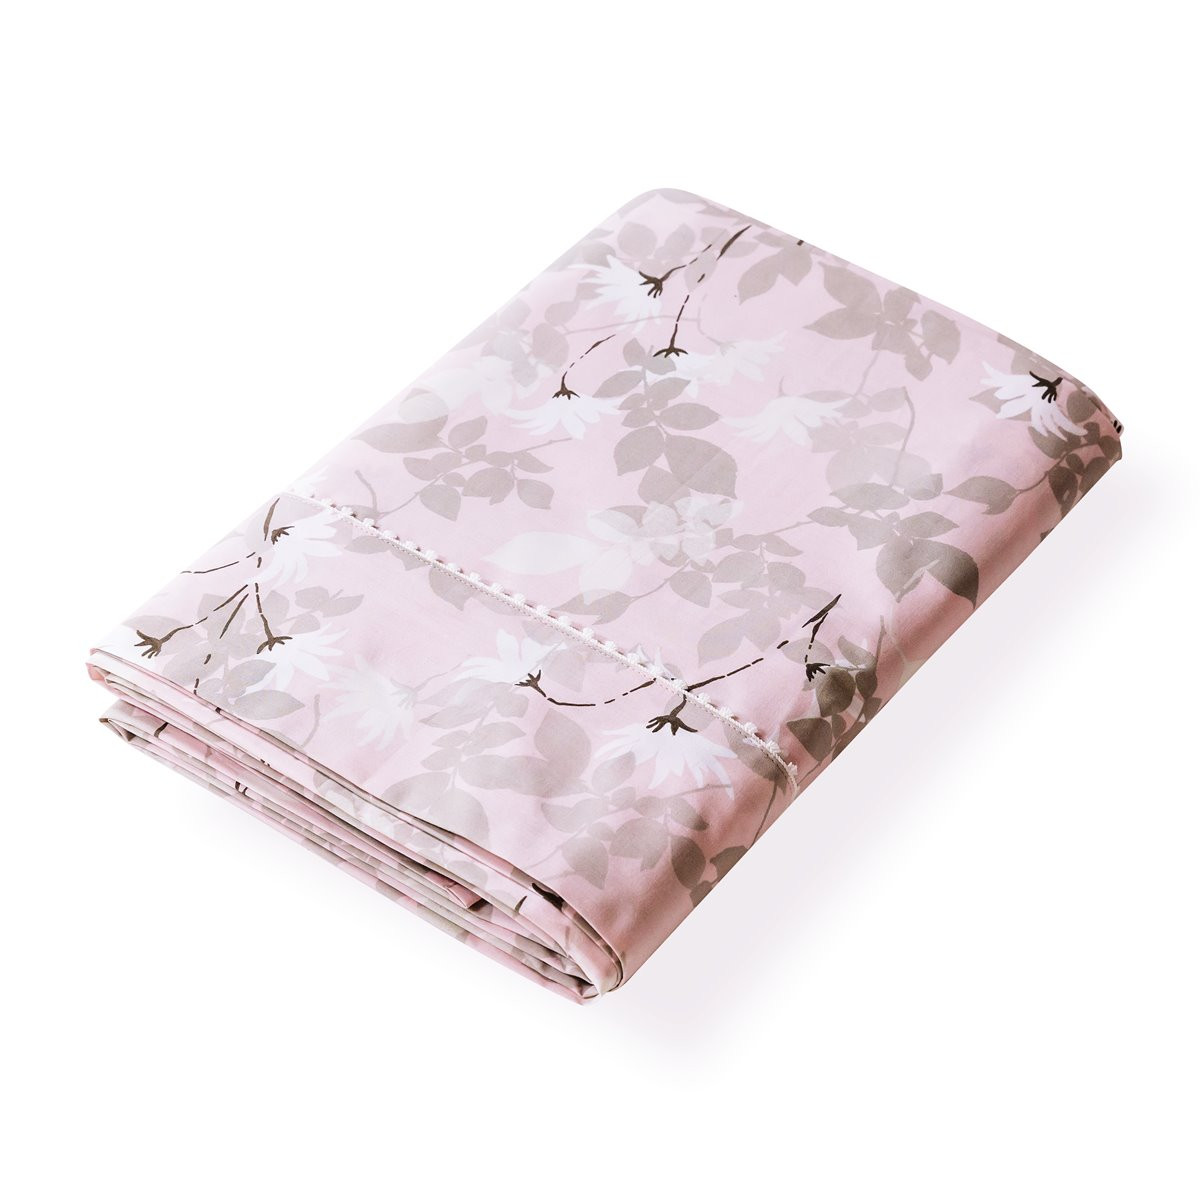 Daisy flat sheet